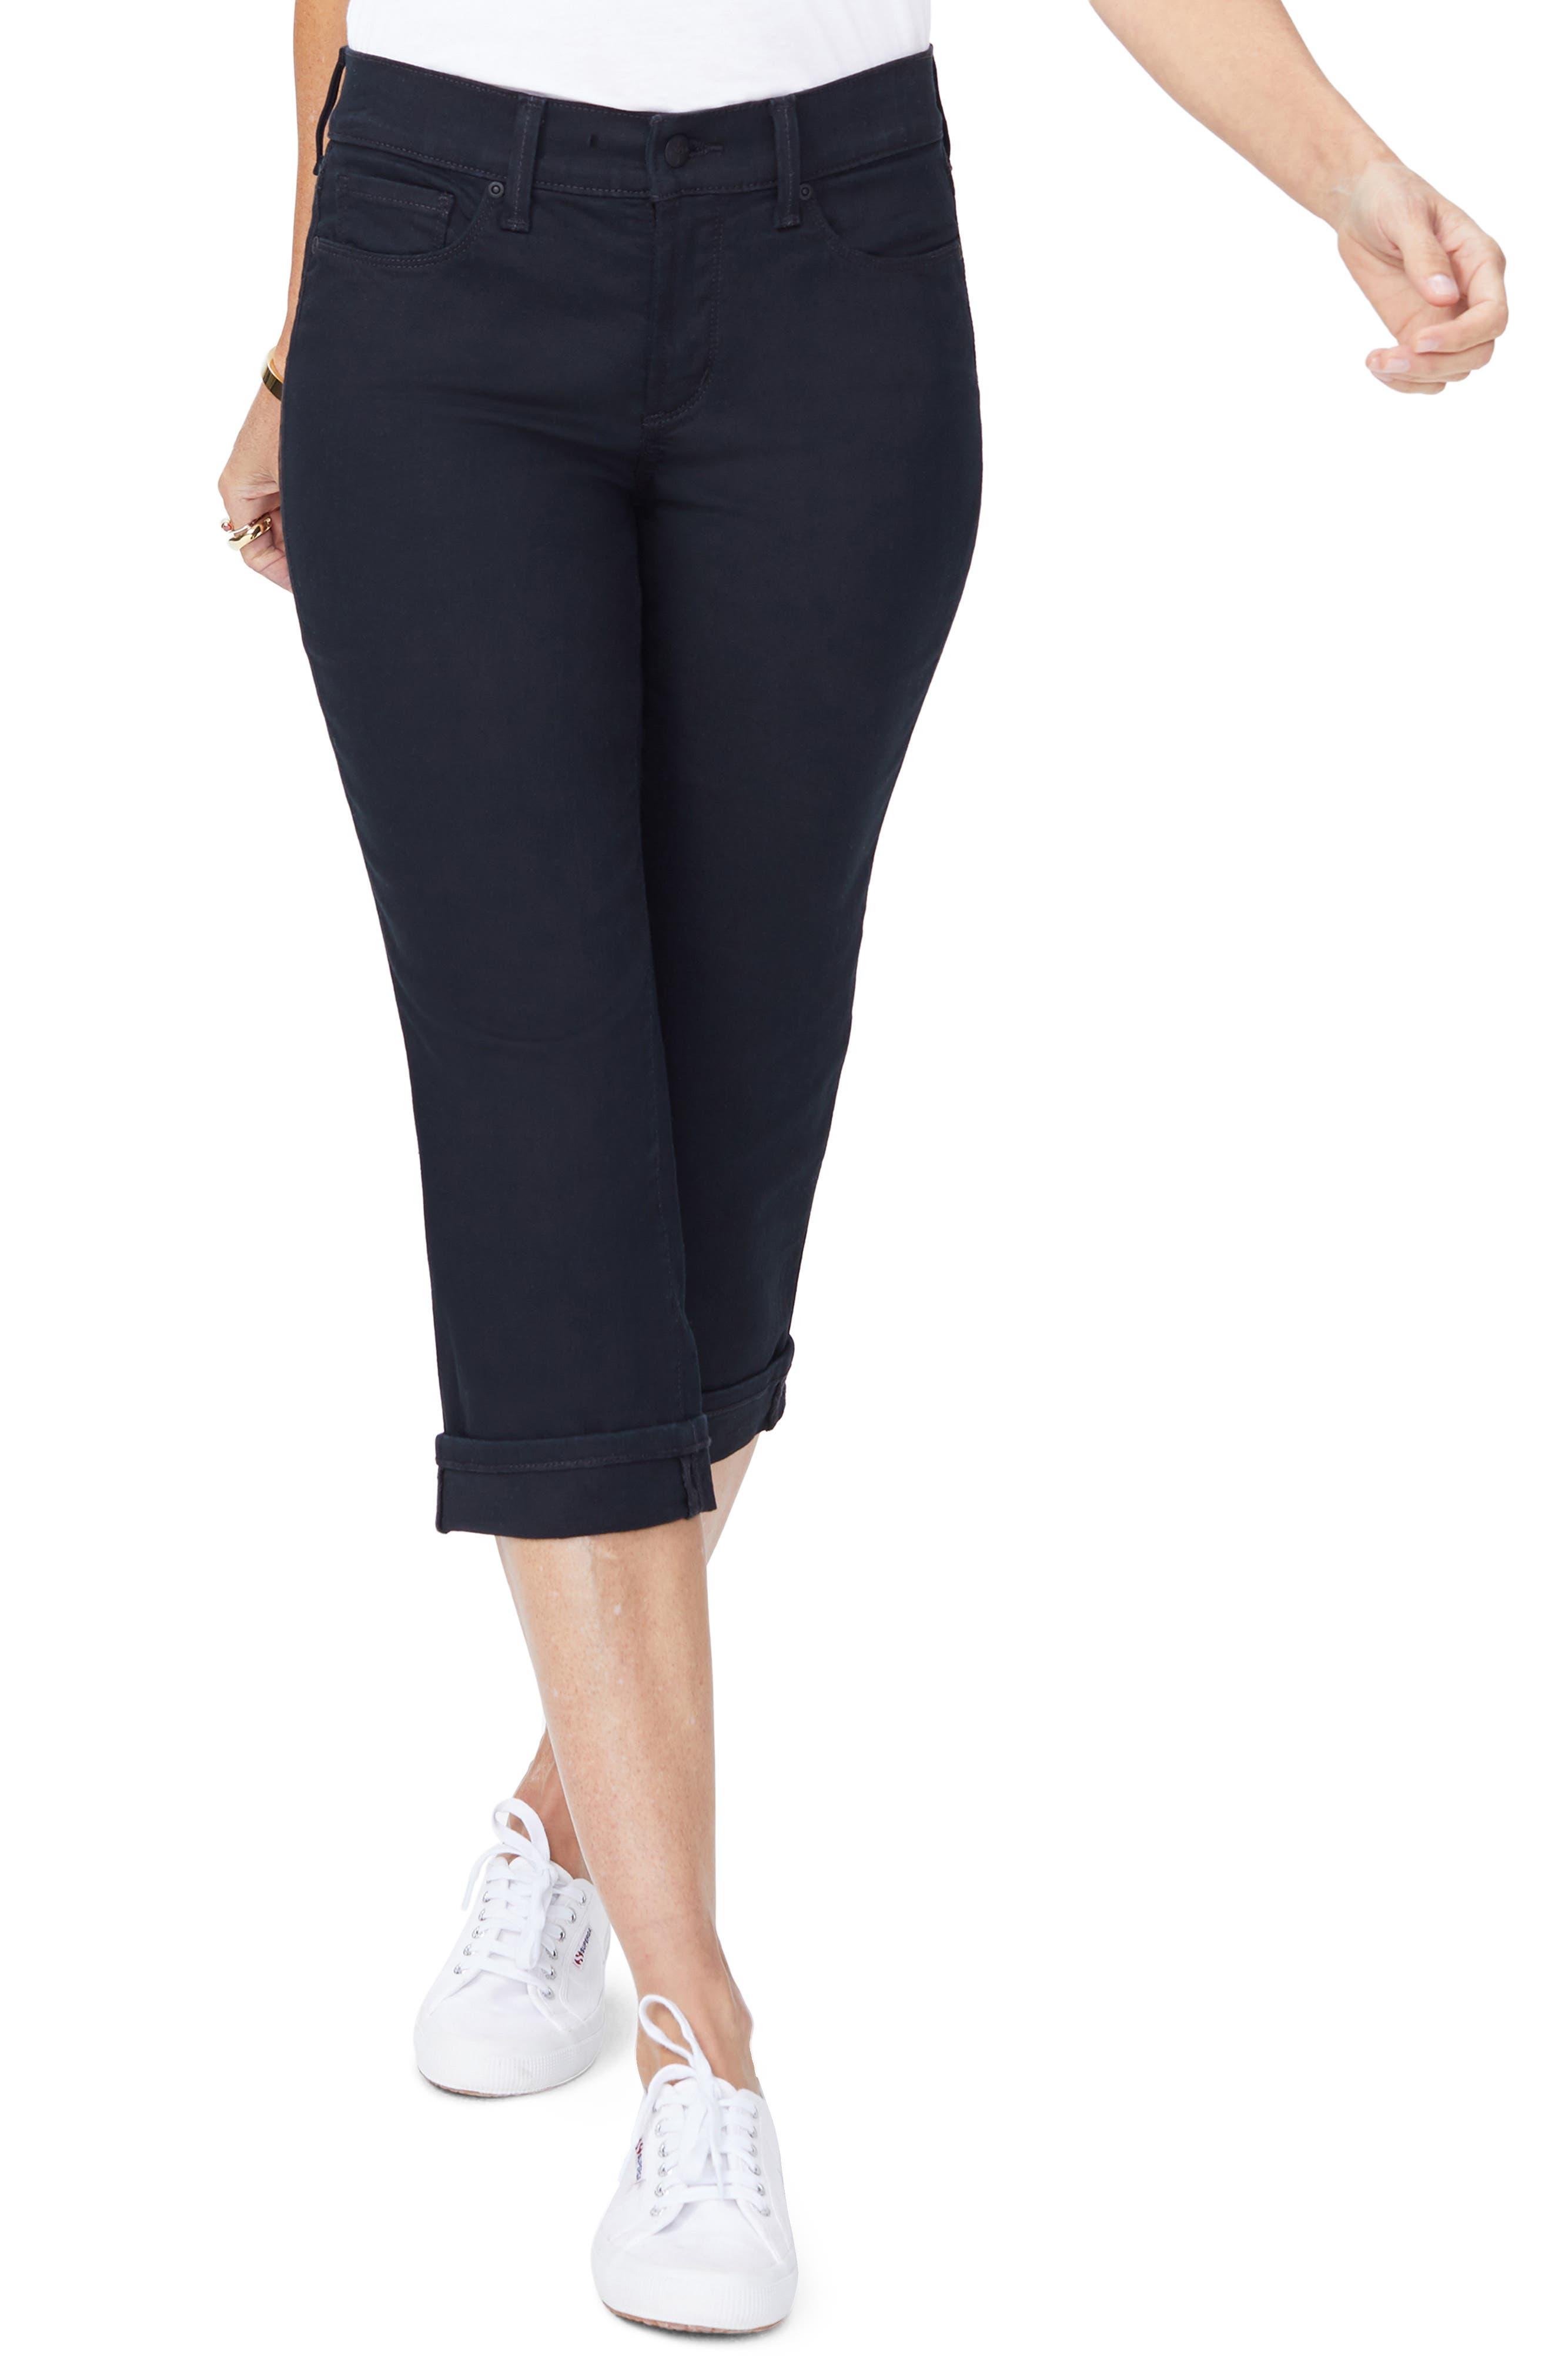 NYDJ, Marilyn Crop Jeans, Main thumbnail 1, color, BLACK